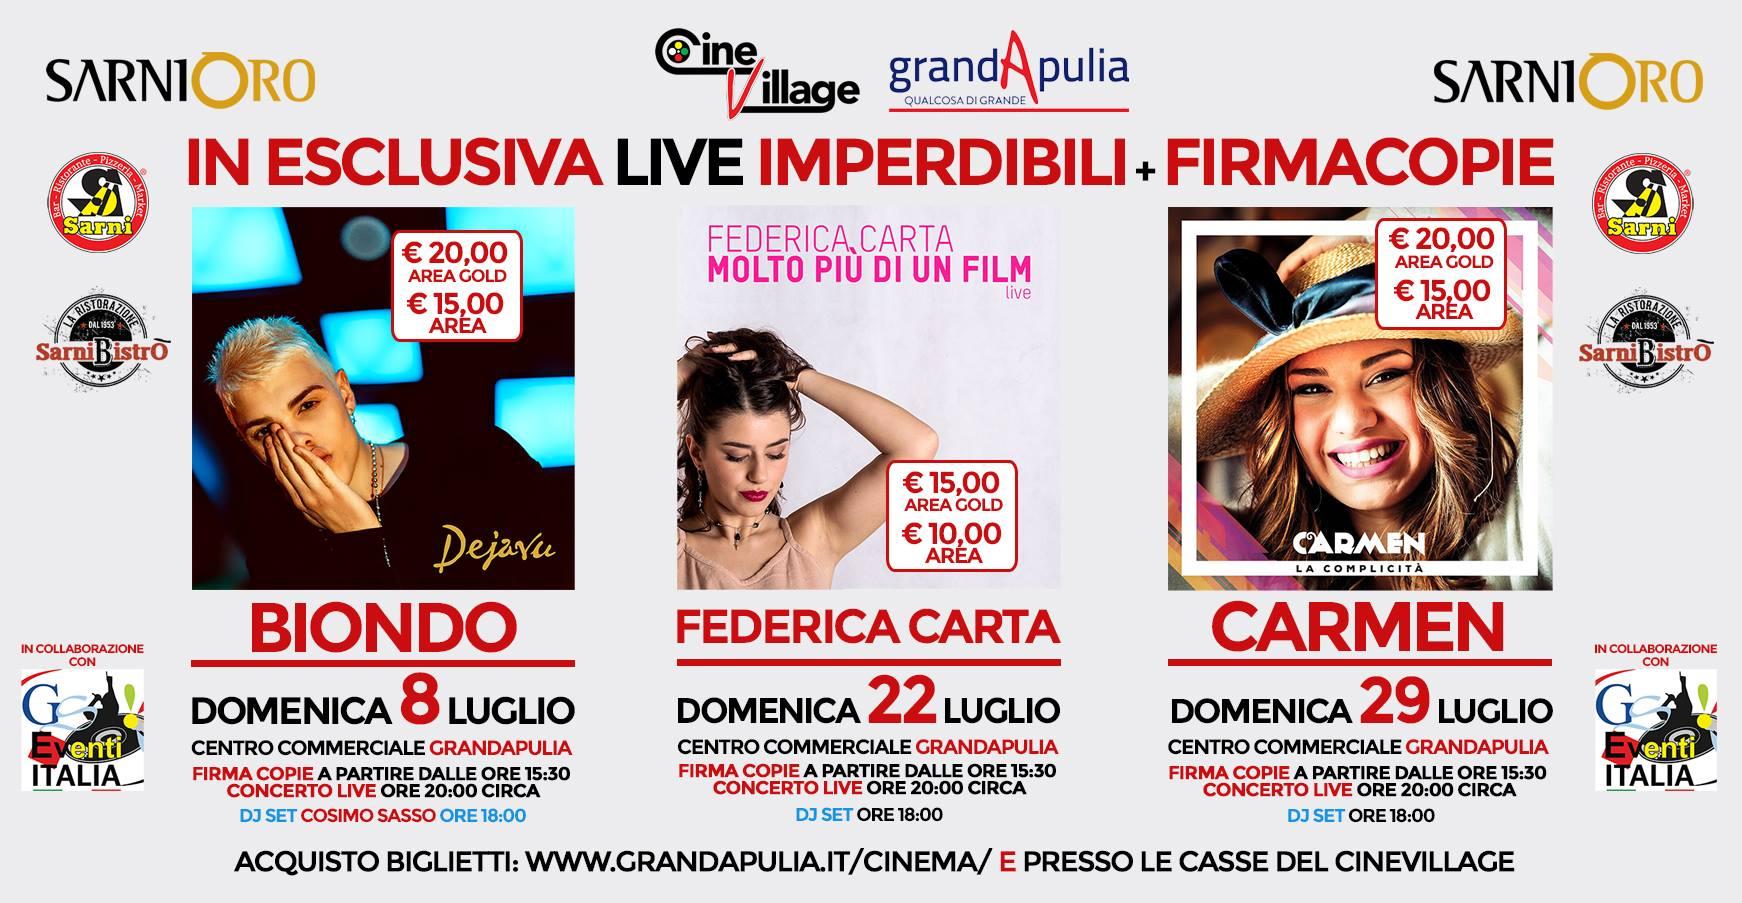 GrandApulia Biondo, Carmen, Federica Carta